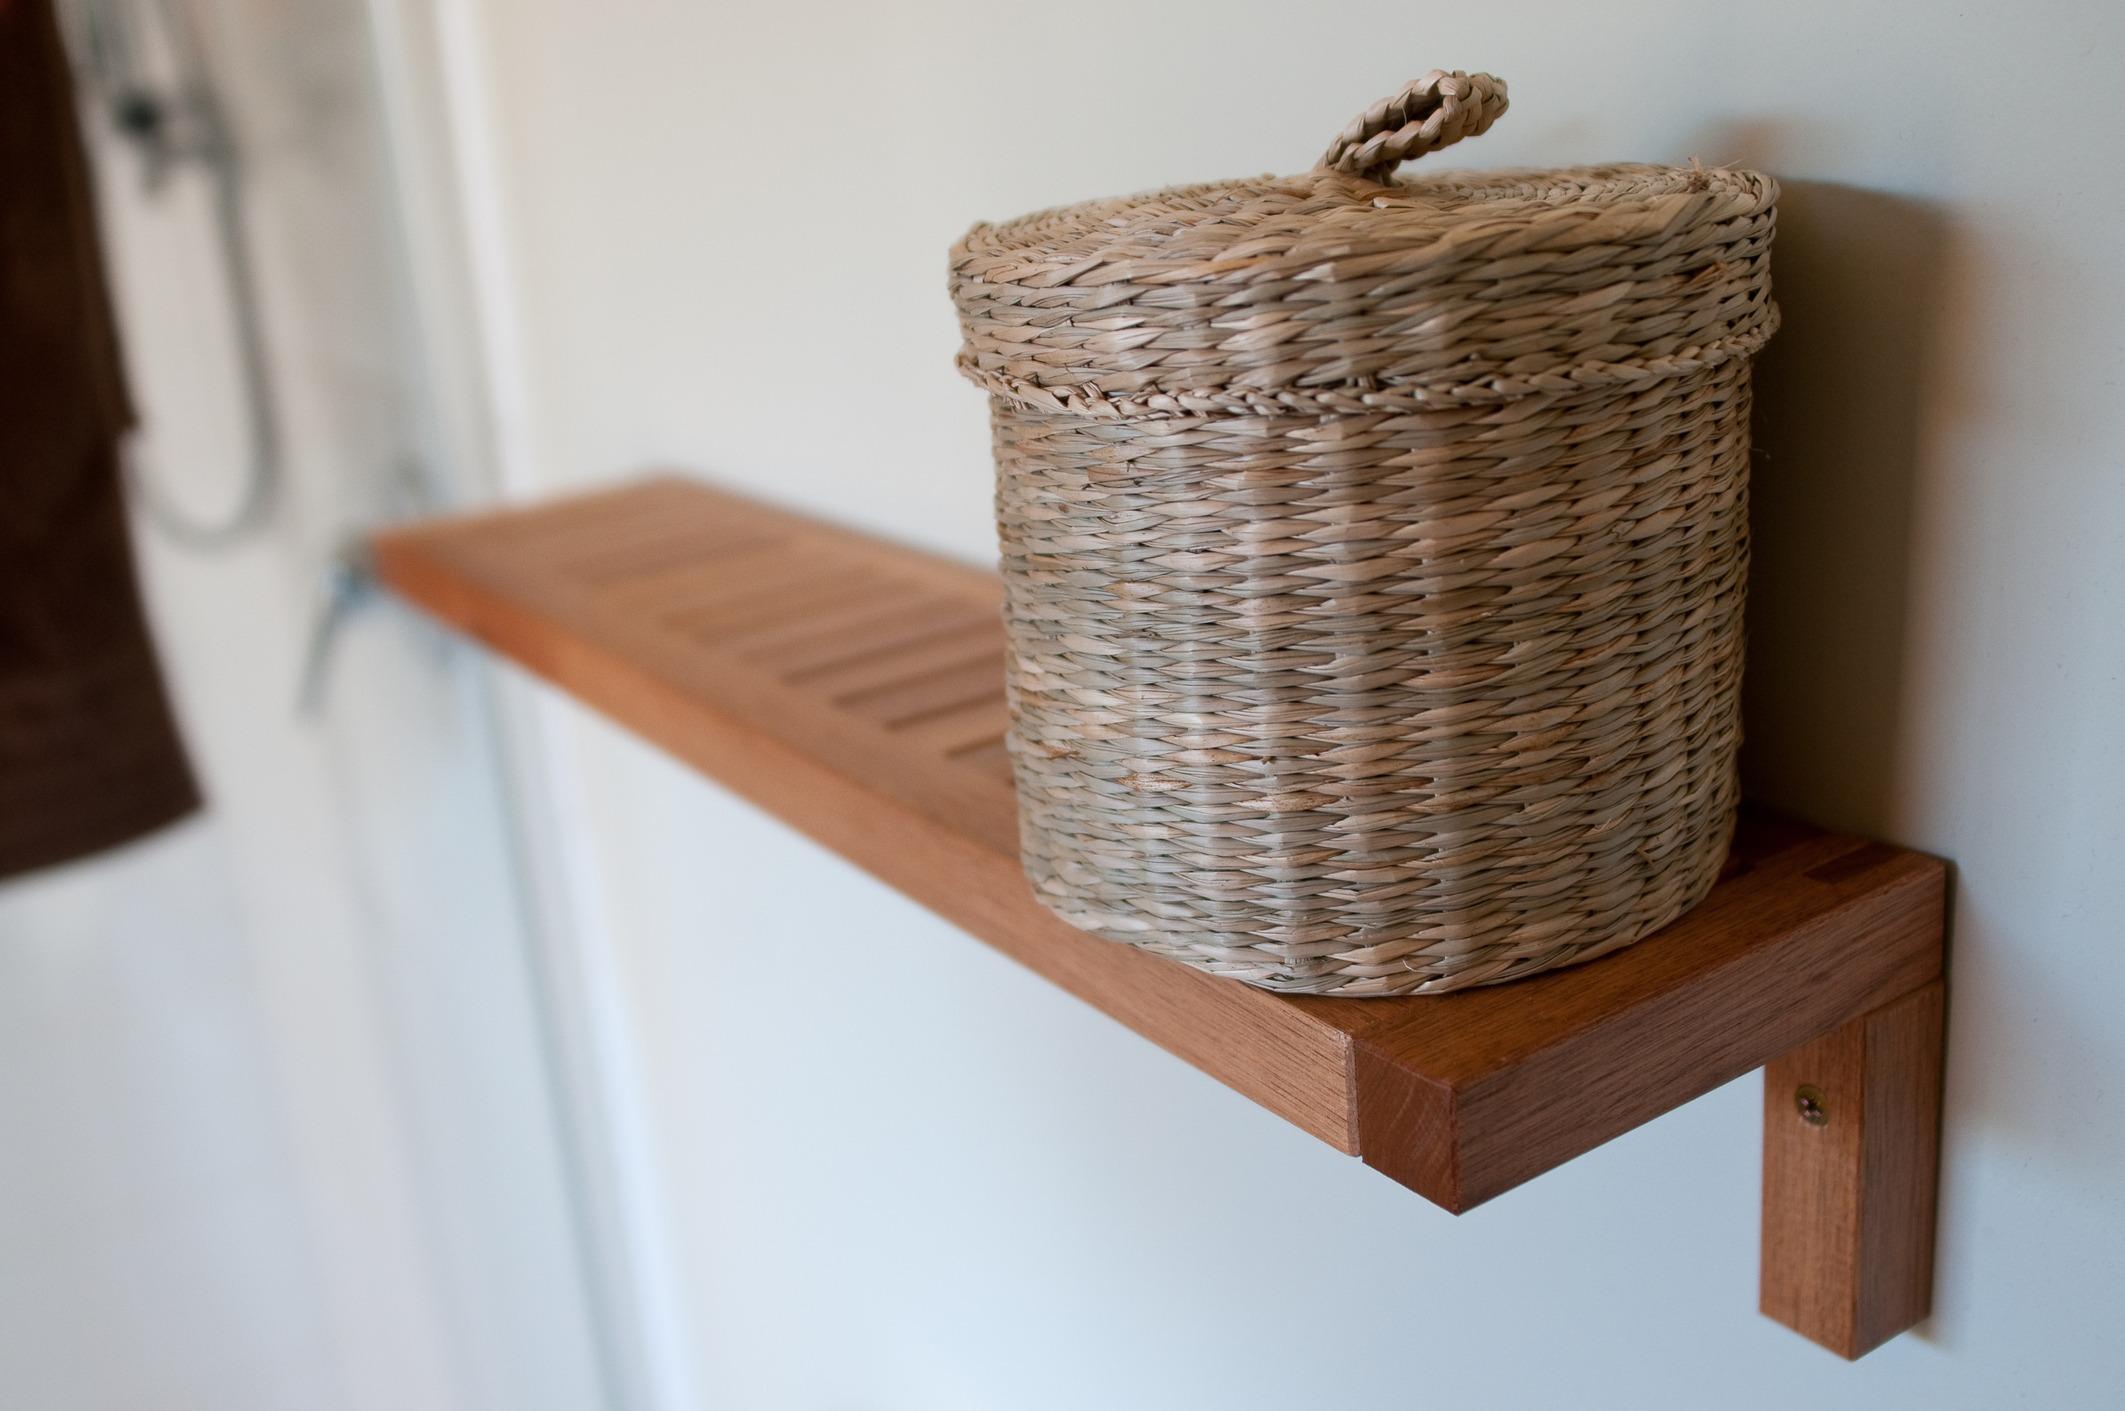 Basket storage in bathroom